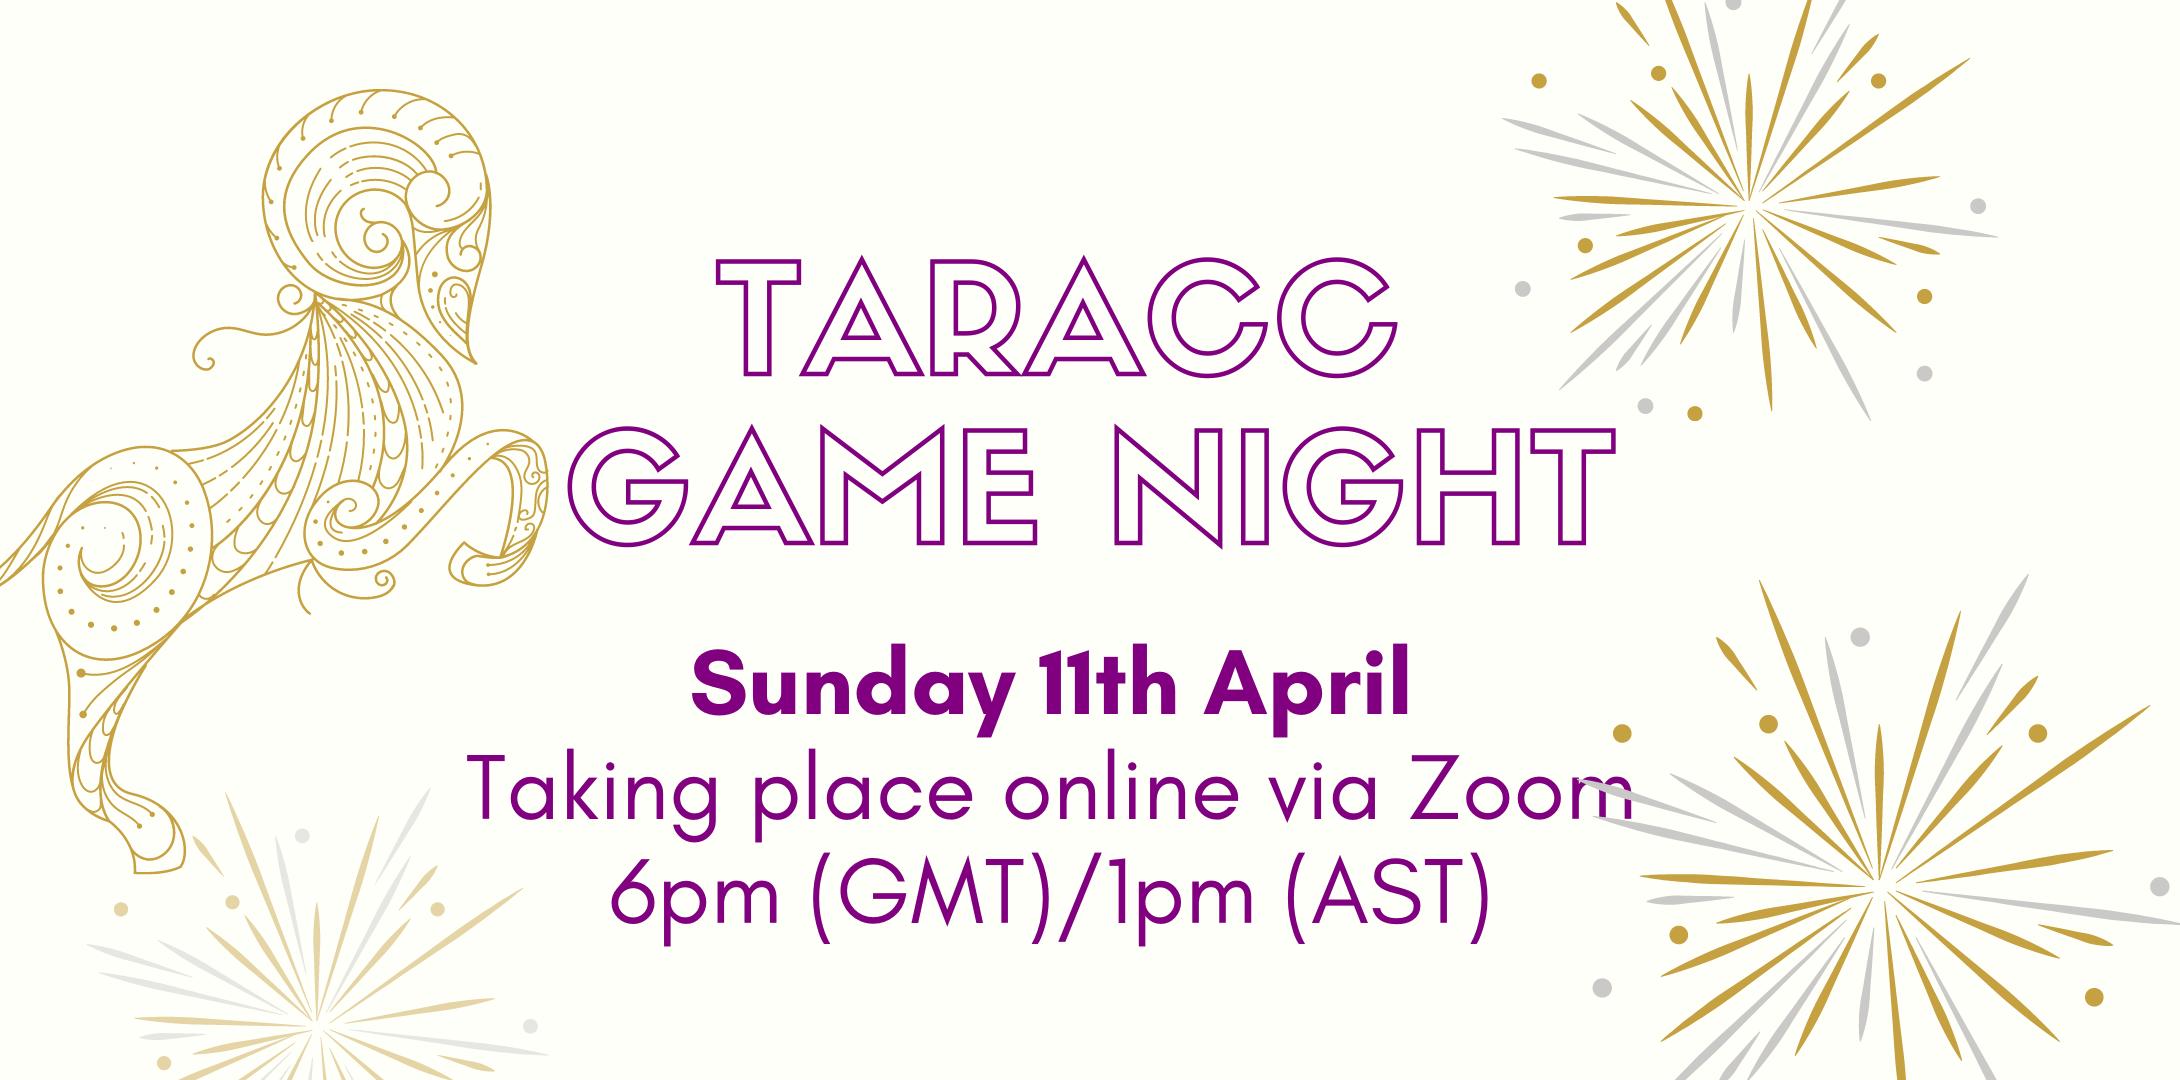 TARACC Game Night website header